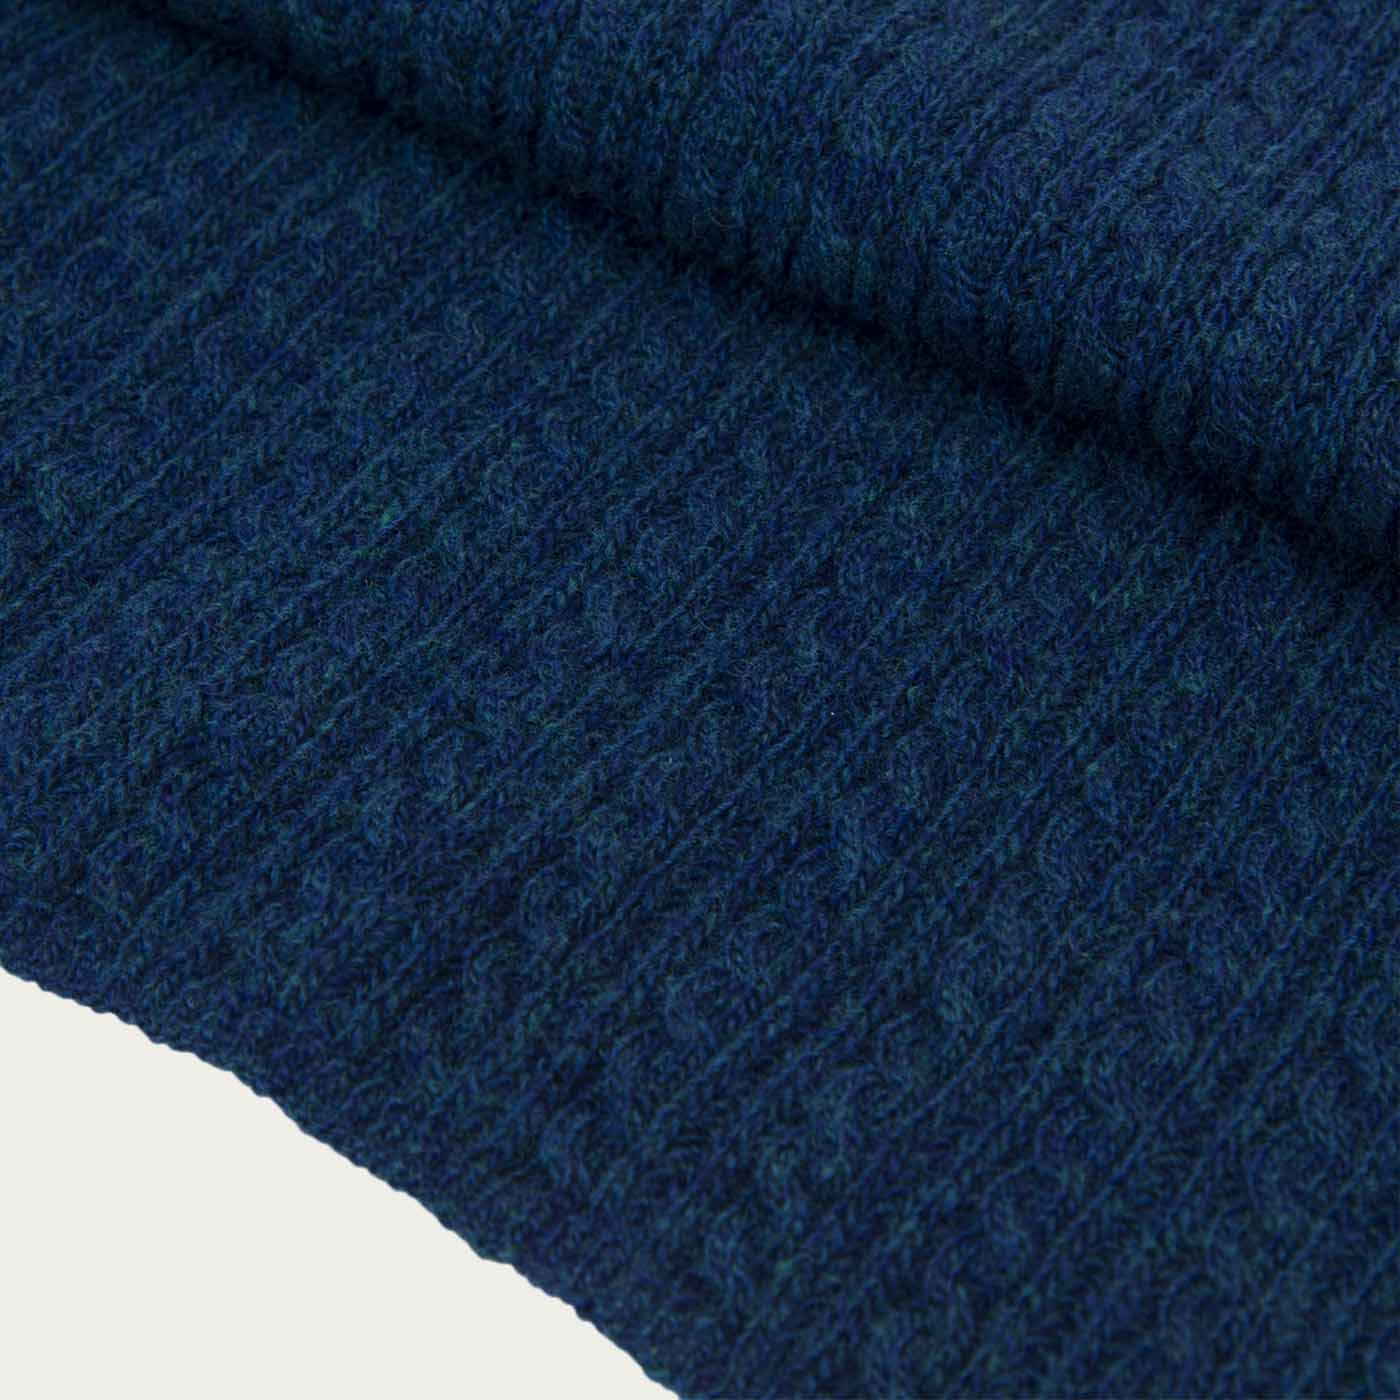 Petrol Blue Braided Wool & Cashmere Scarf | Bombinate